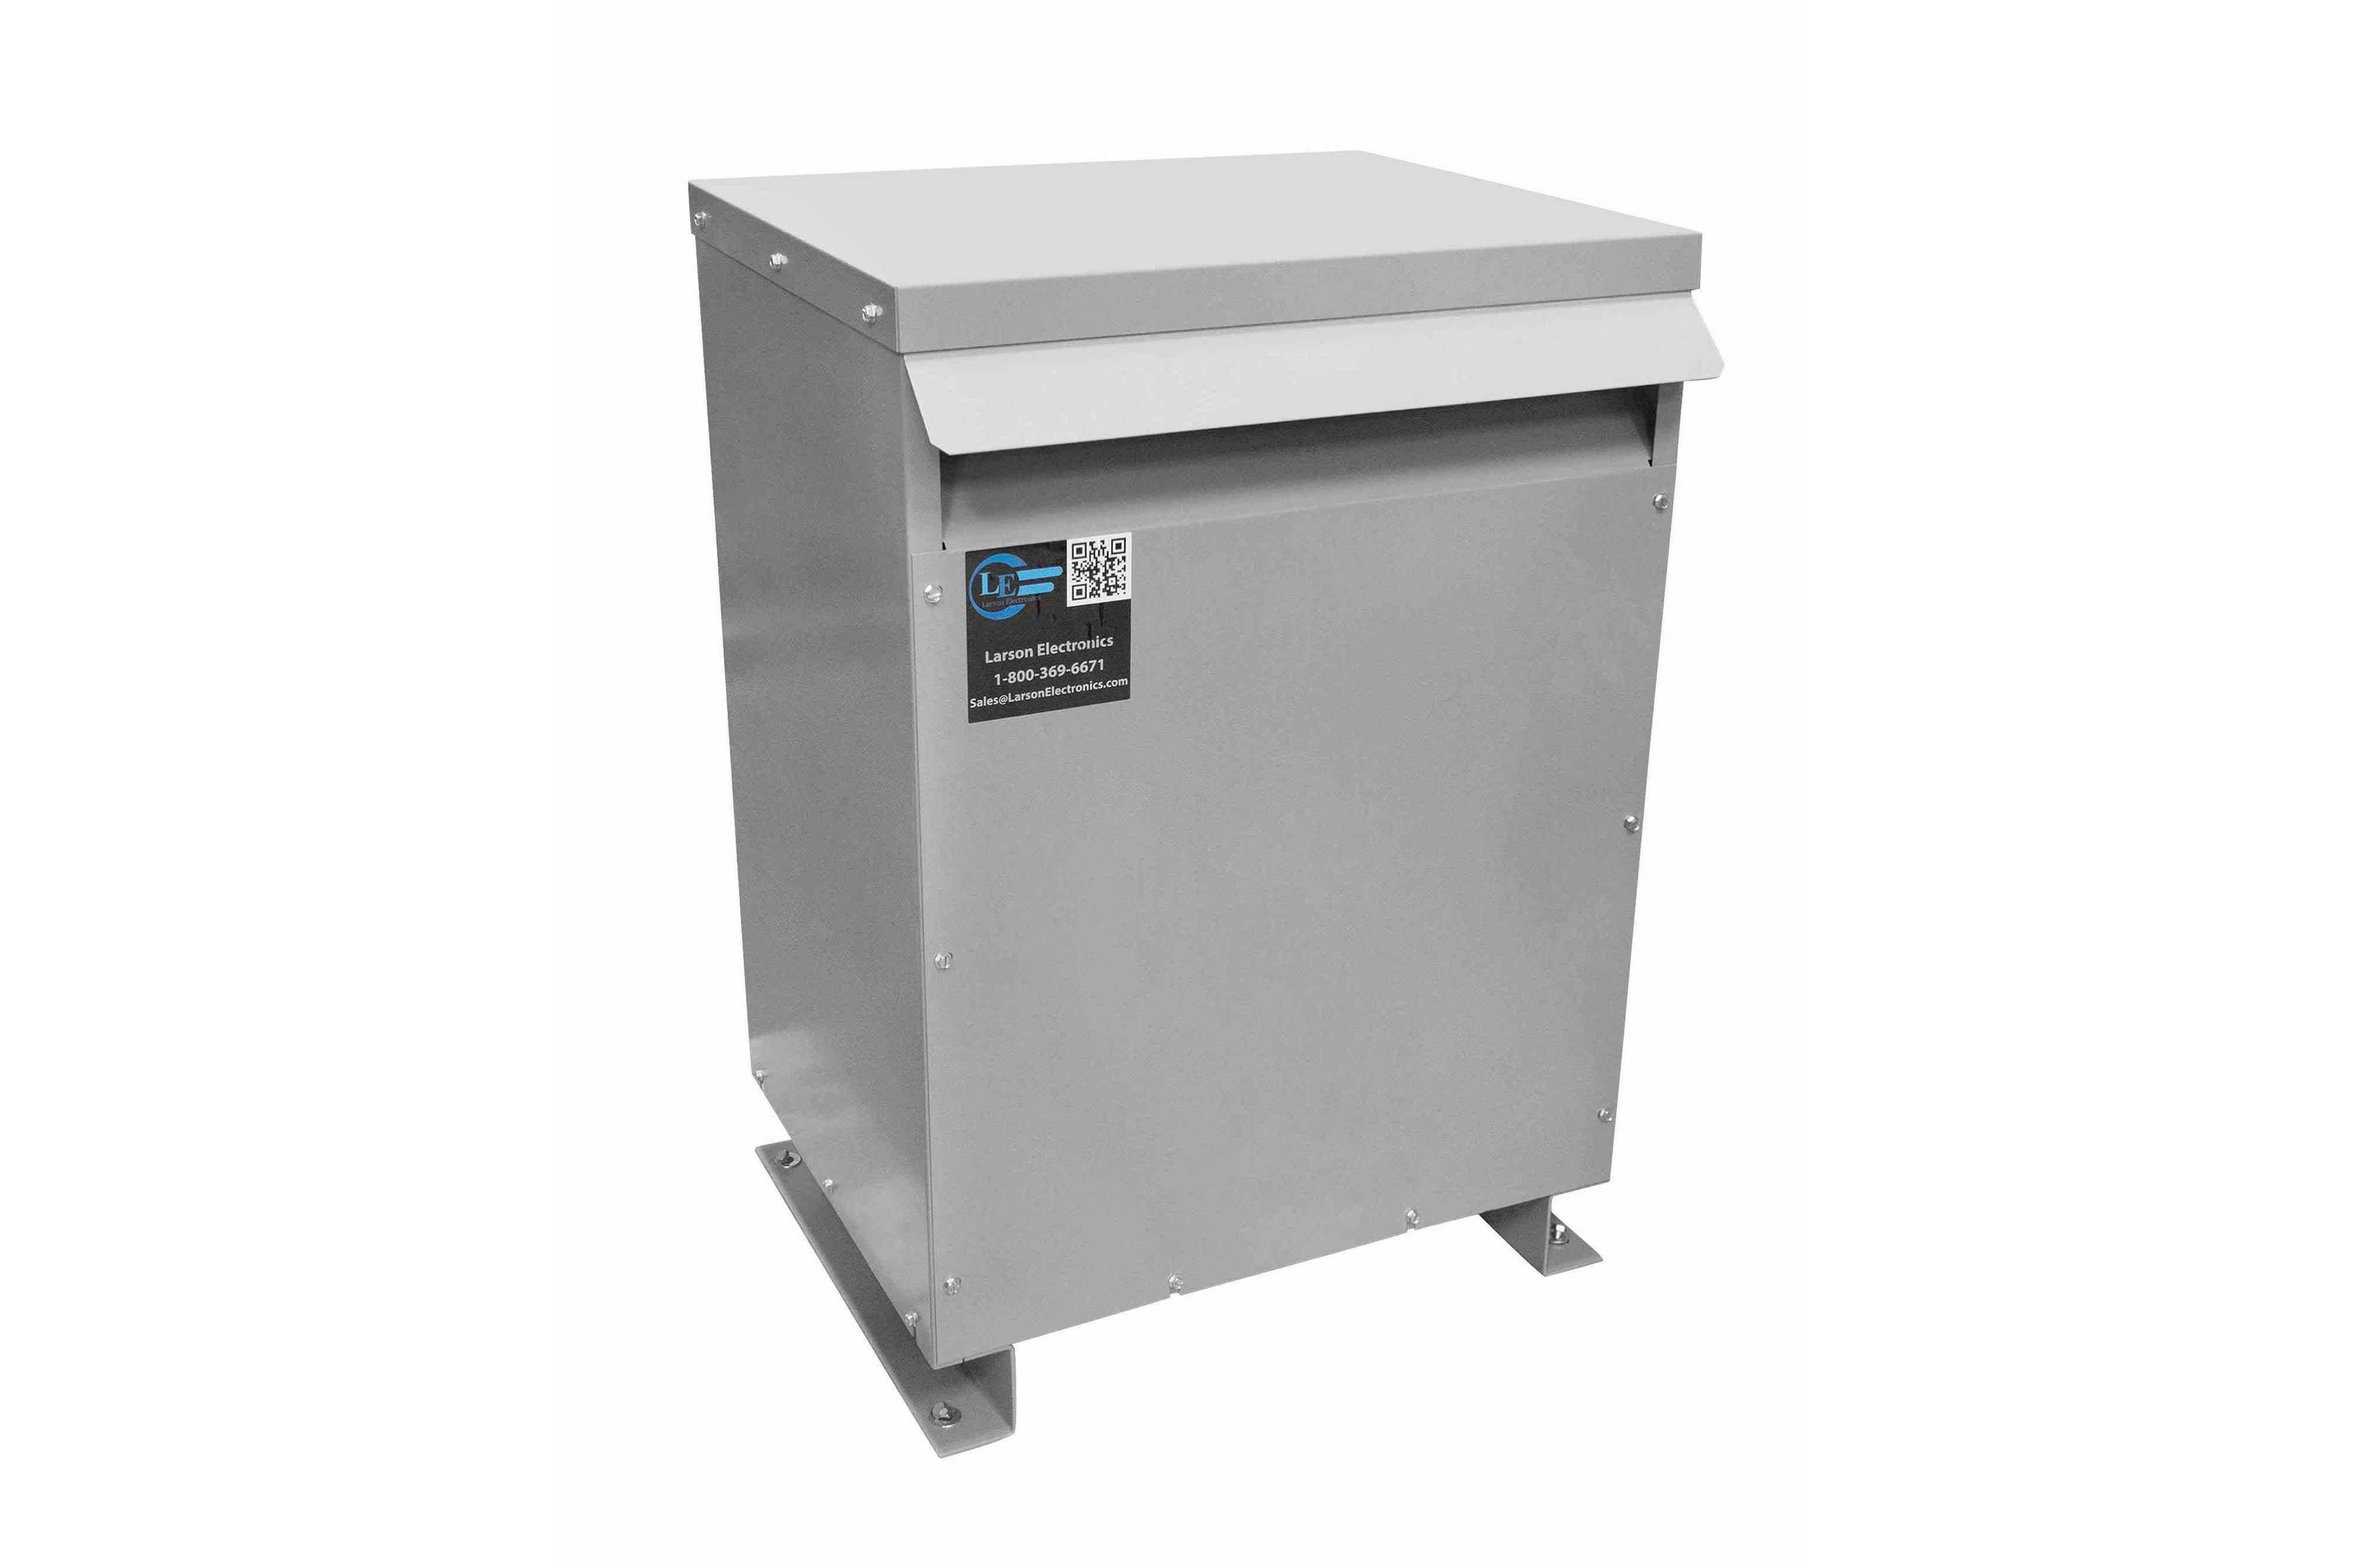 500 kVA 3PH Isolation Transformer, 575V Wye Primary, 415V Delta Secondary, N3R, Ventilated, 60 Hz